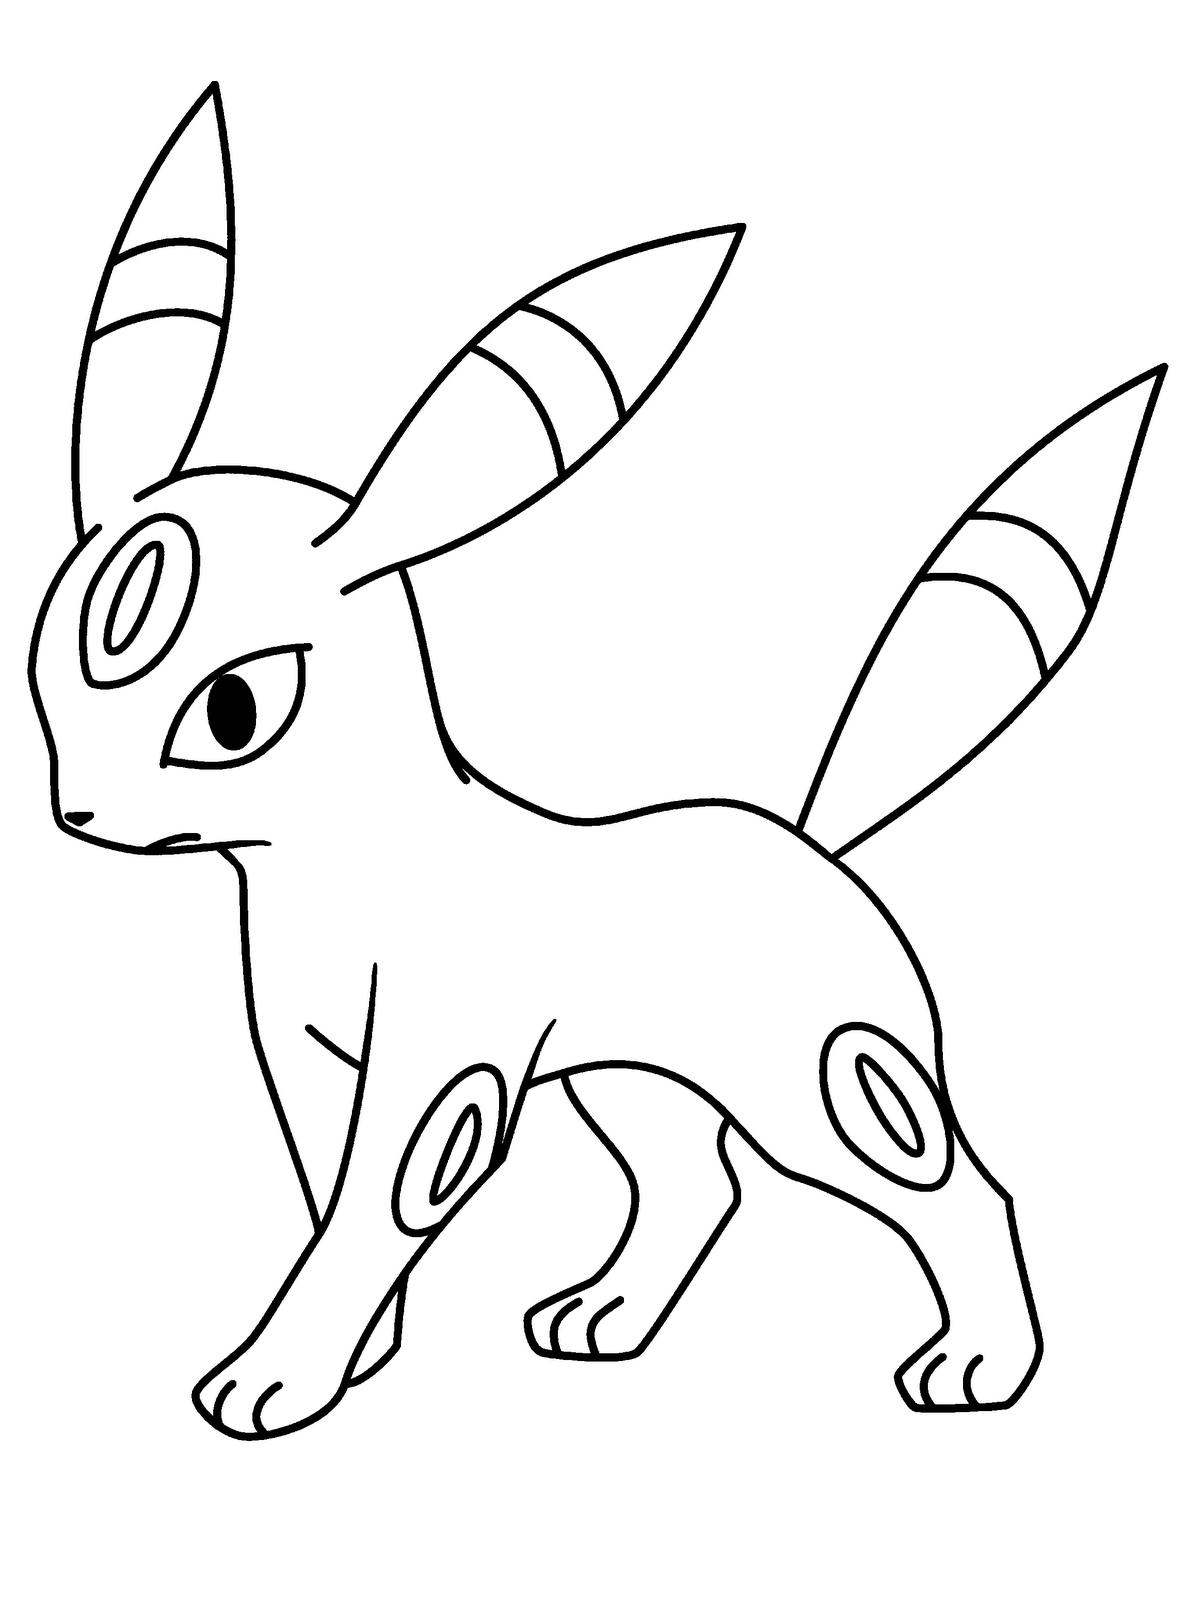 Pokemon Ausmalbilder Yveltal : Pin By D Borah Soltys On Pokemon Pinterest Pok Mon